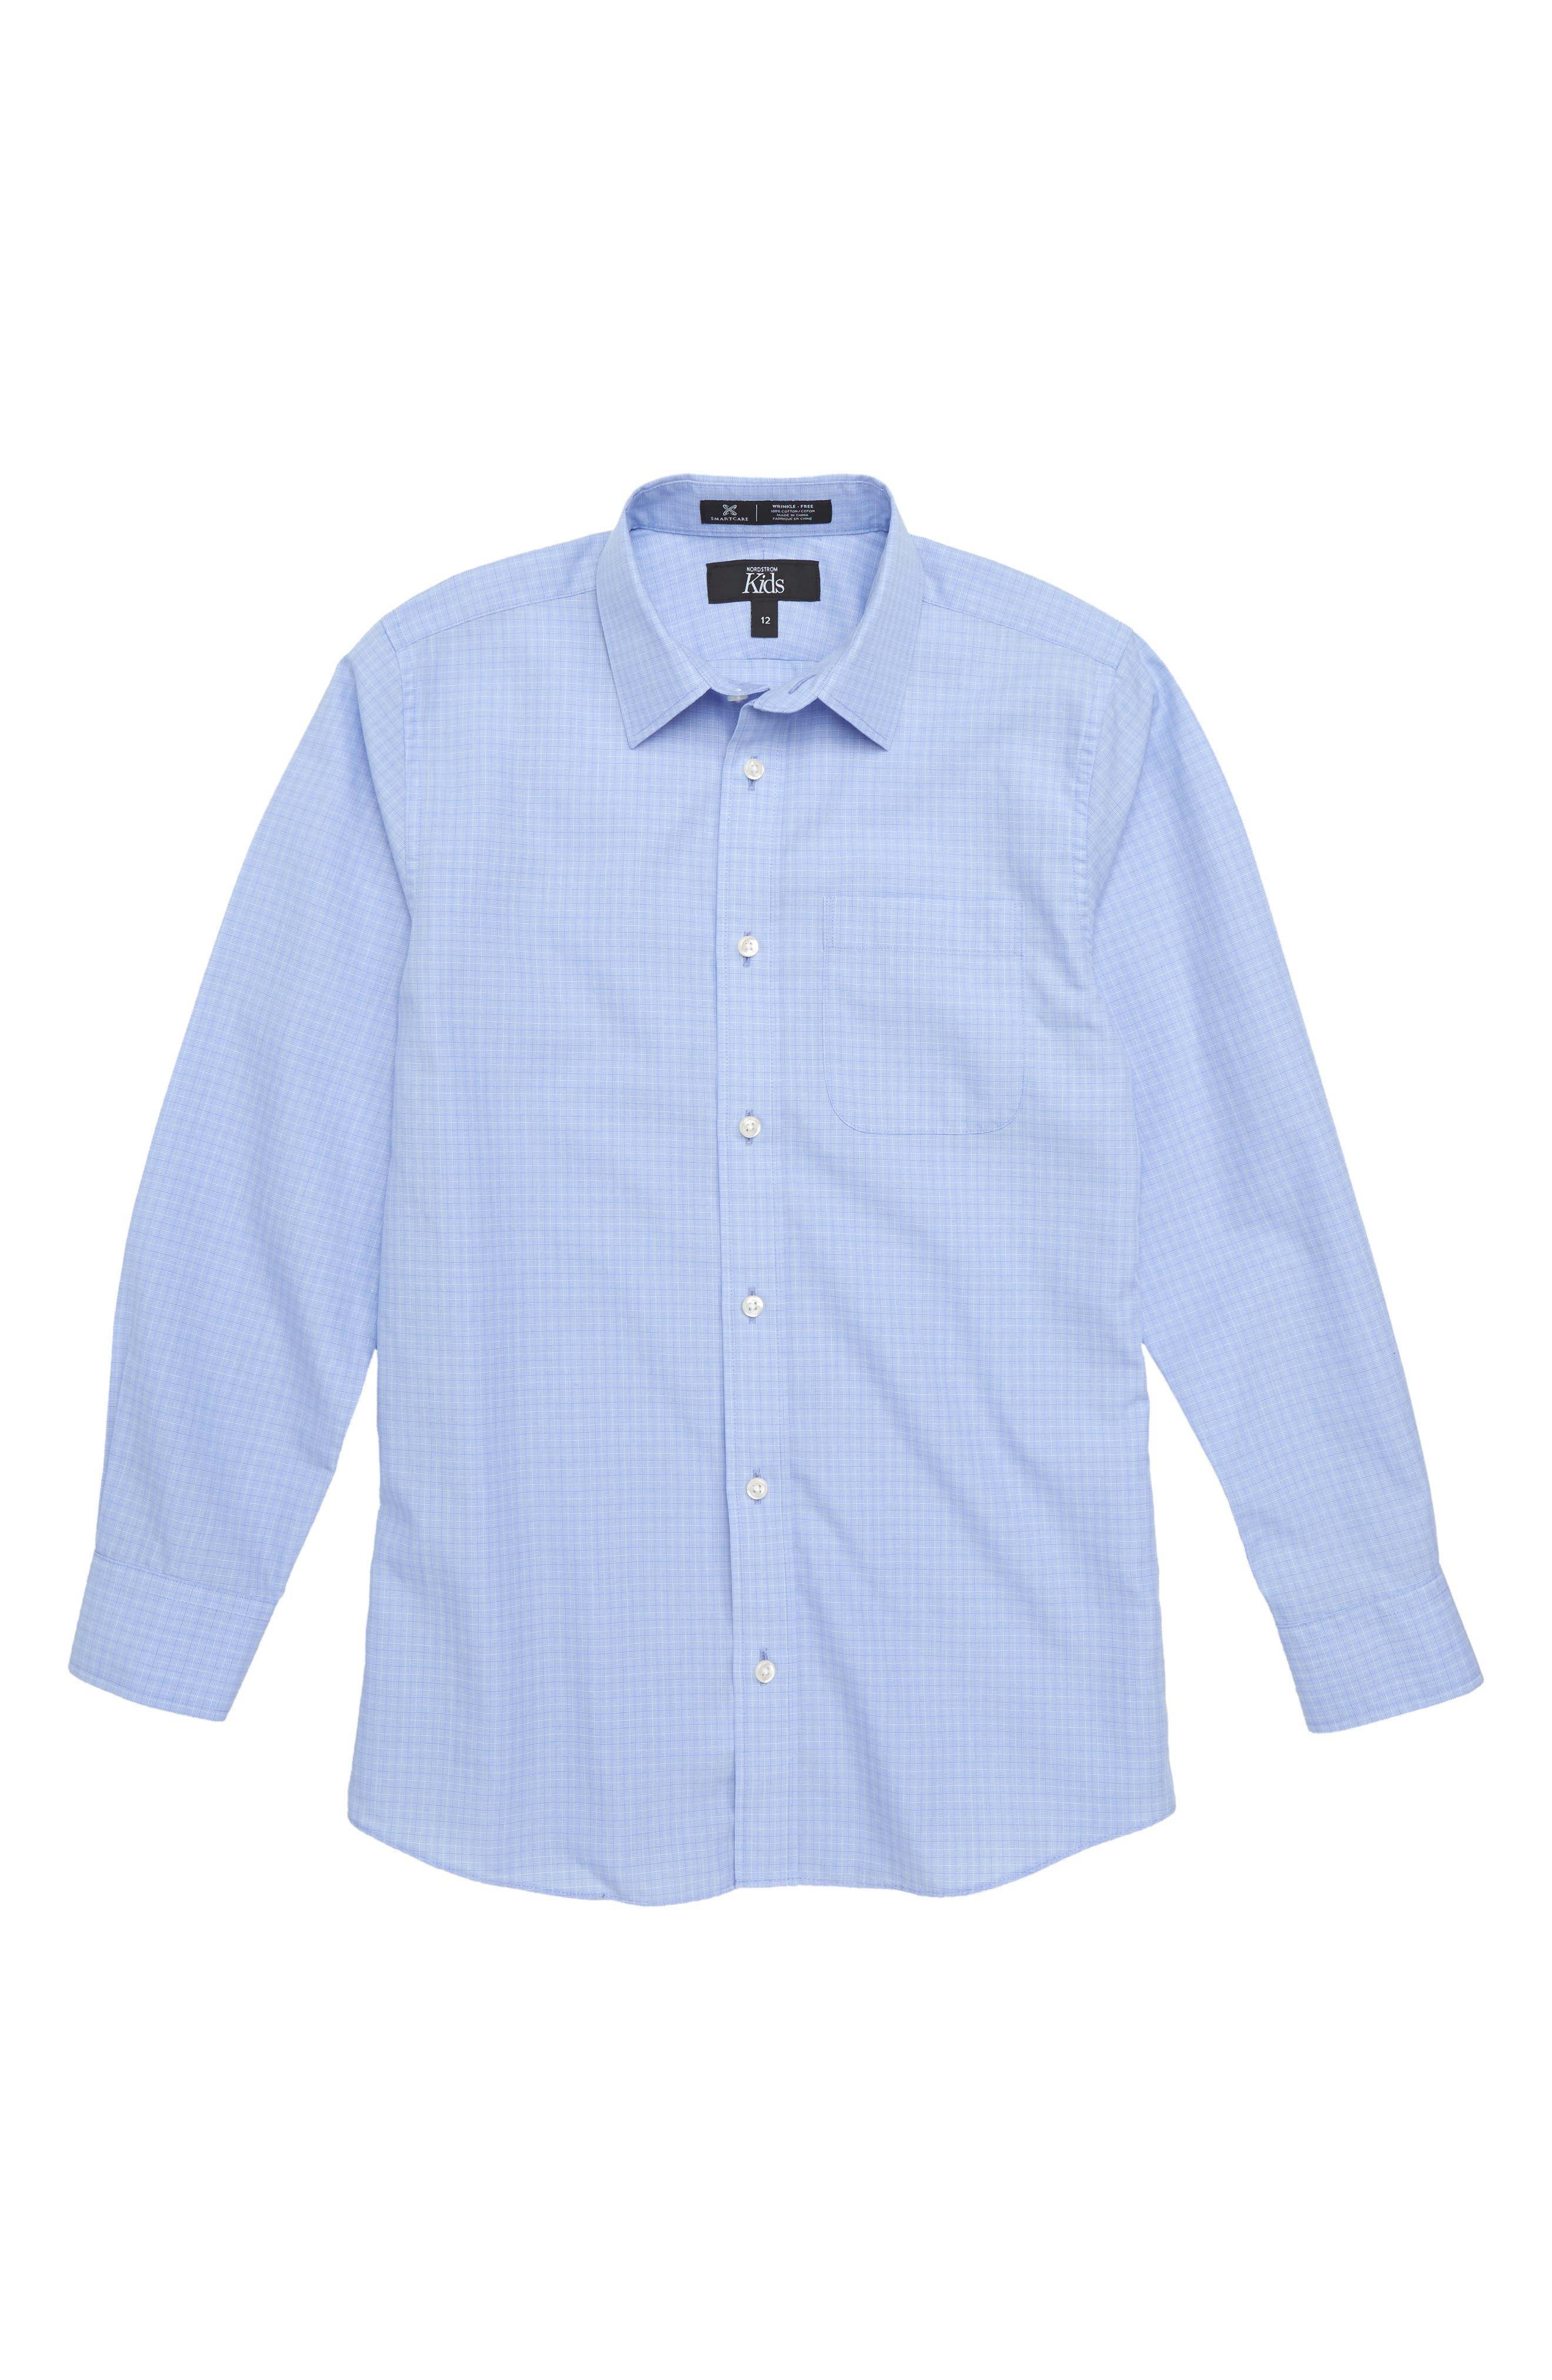 Dobby Checks Dress Shirt,                             Main thumbnail 1, color,                             450